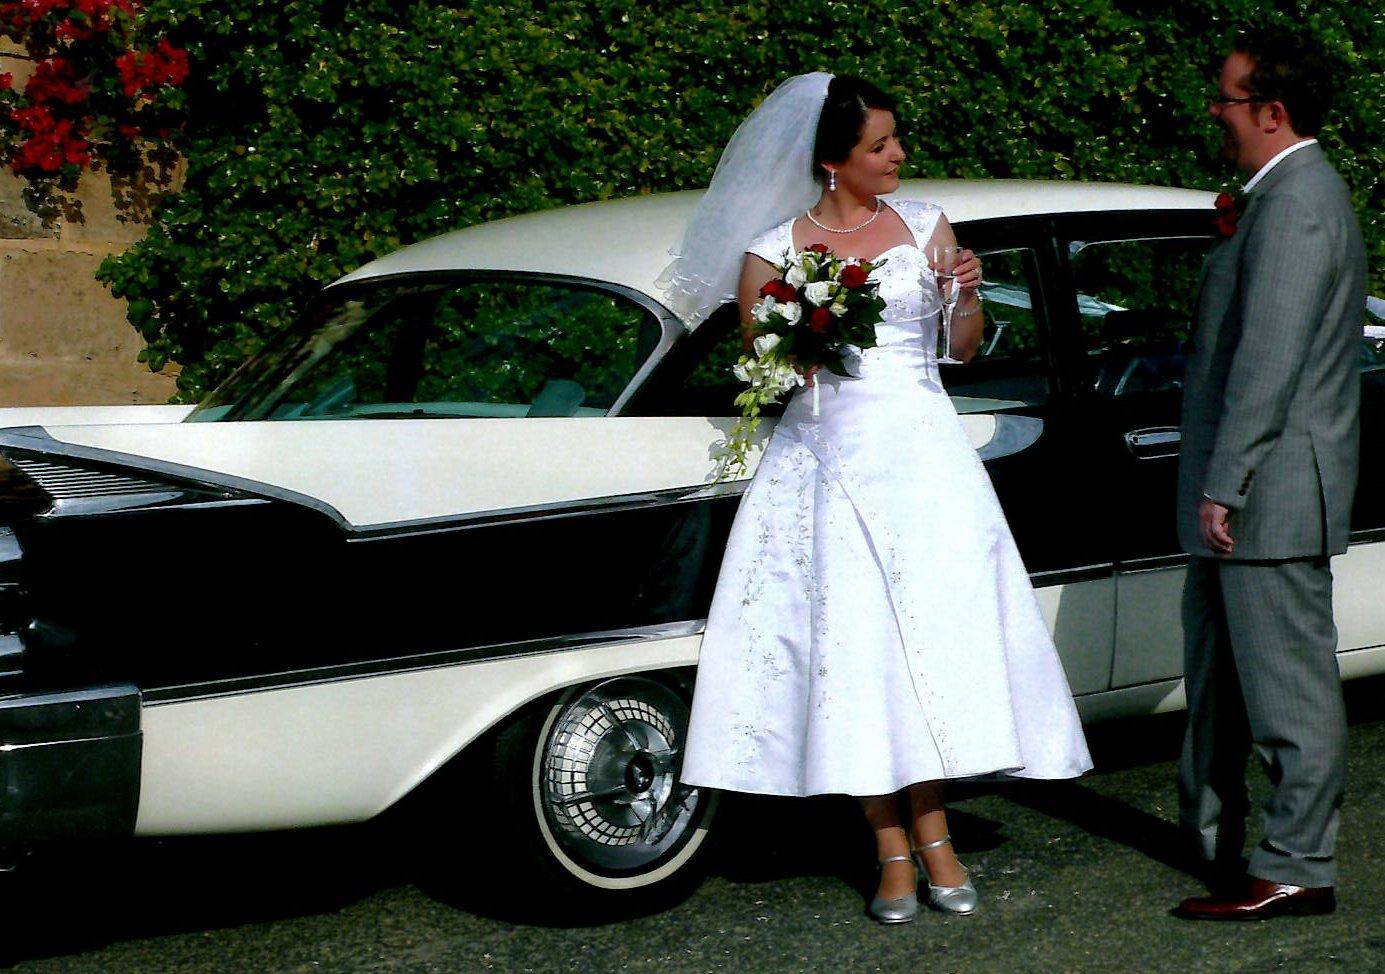 Helen Robson & Nick Barratt's Wedding, Perth 2012. Image courtesy of Helen Robson and Nick Barratt.